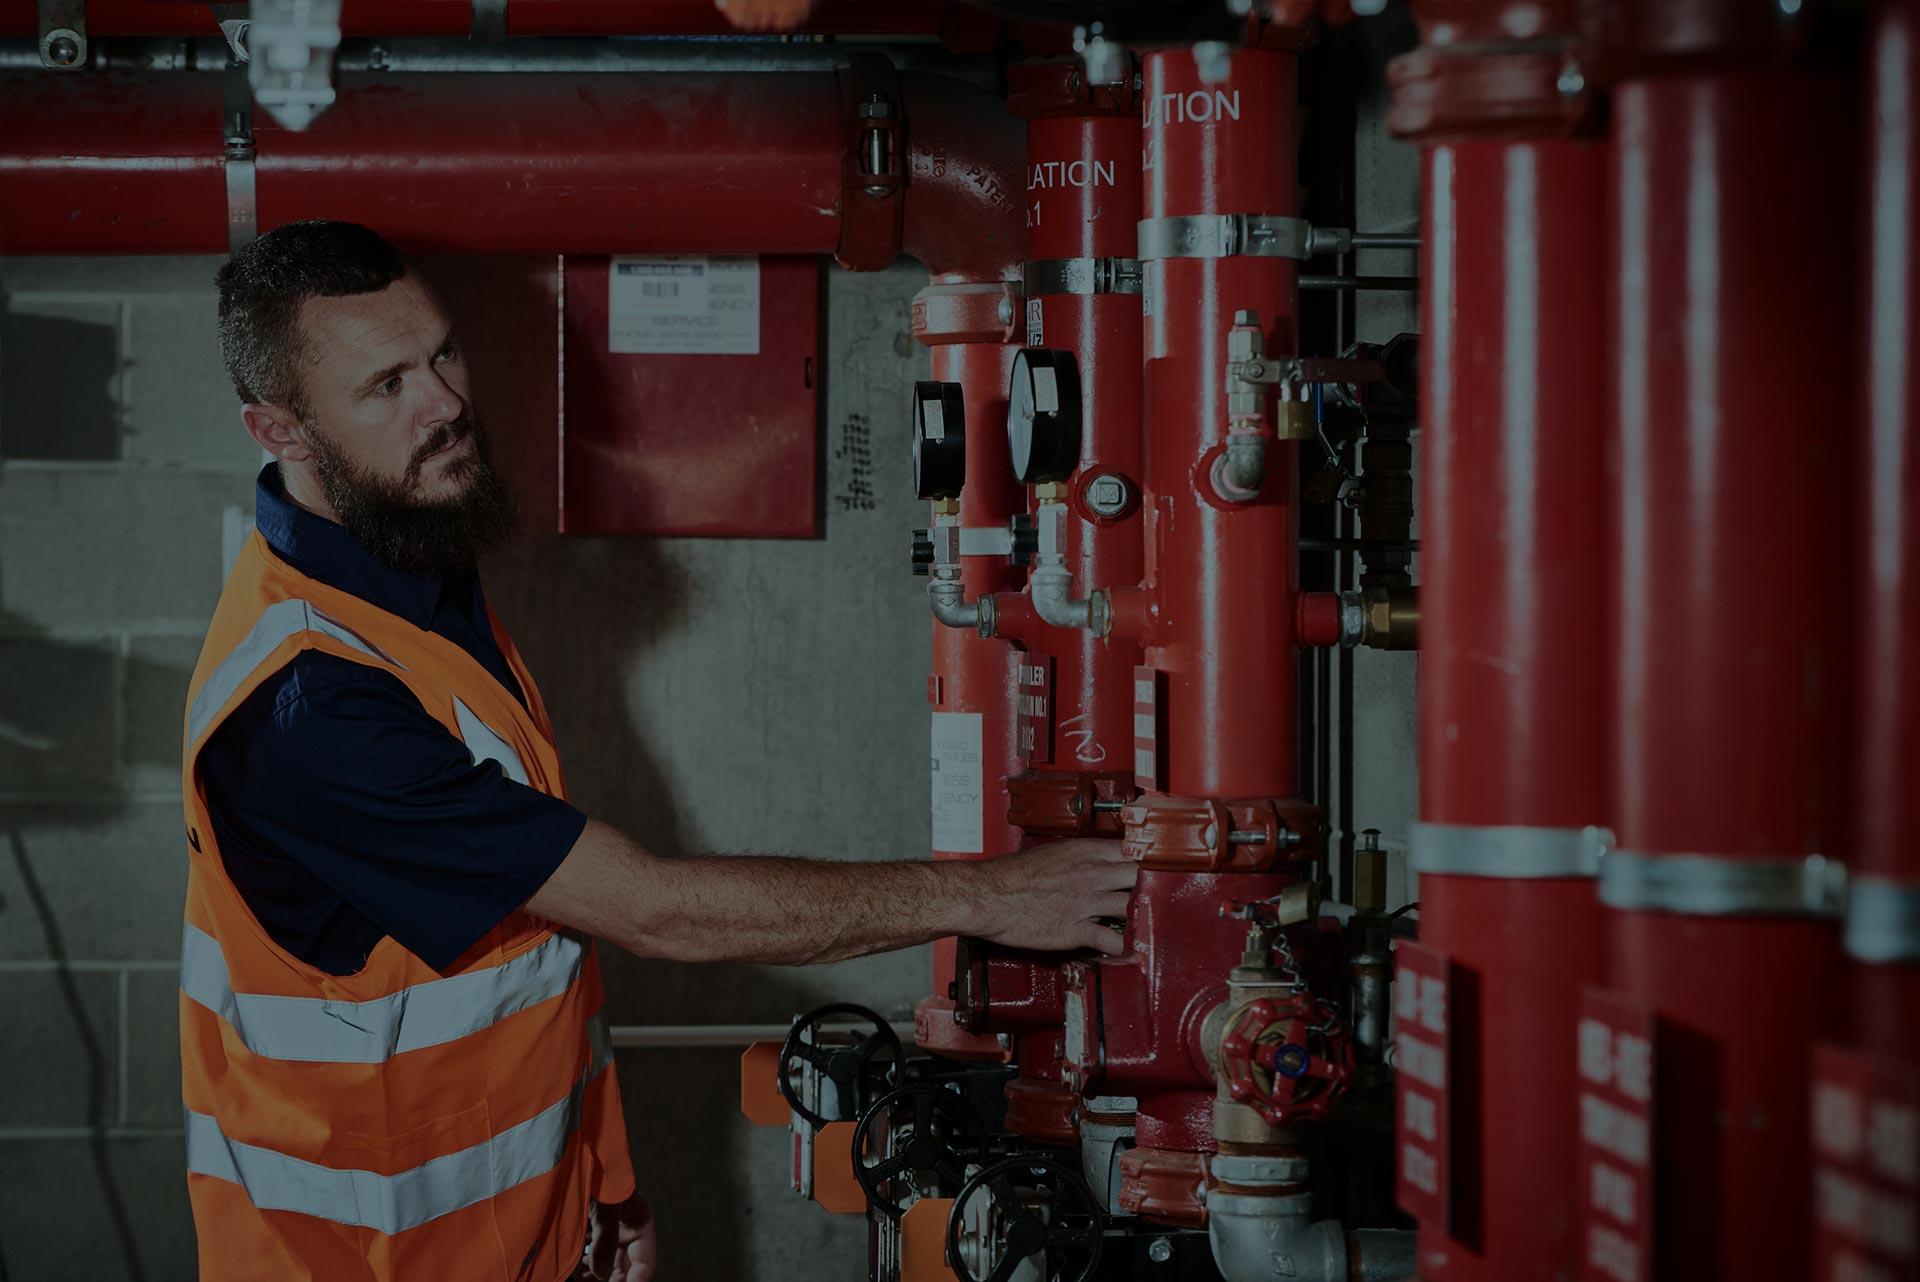 An Alexon employee performing maintenance on some fire equipment.